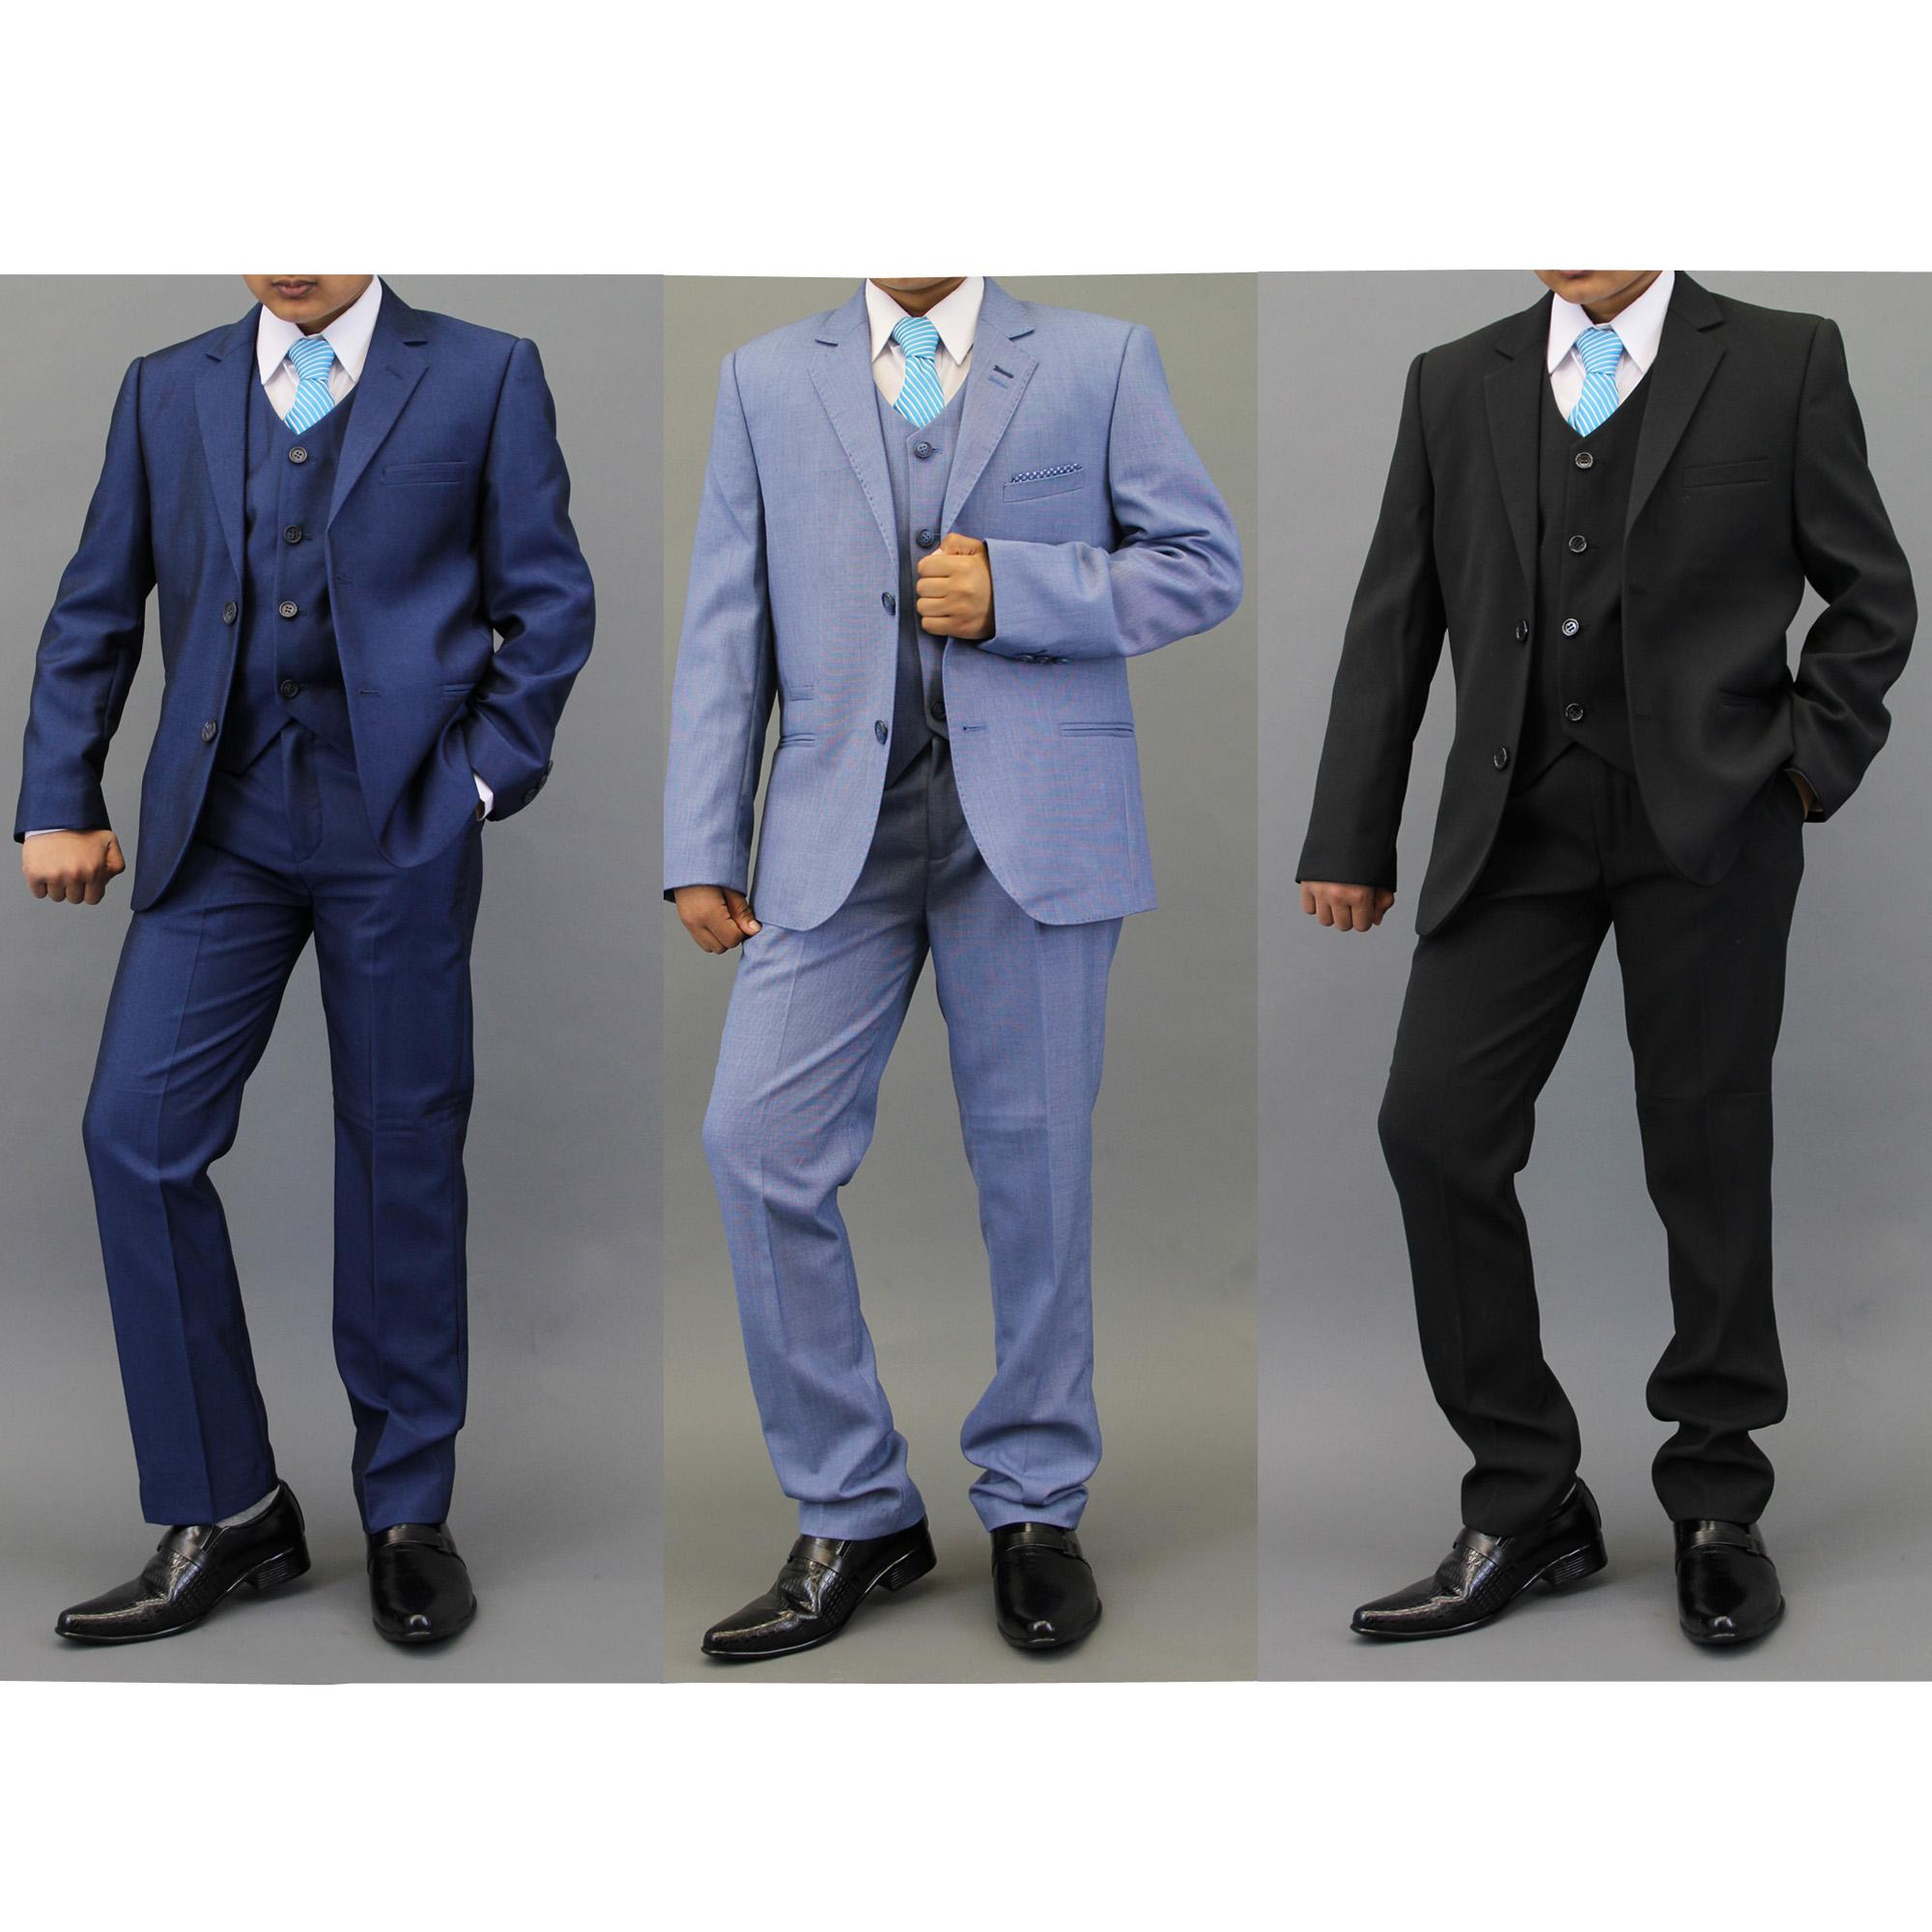 Boys Kids Blazers Waistcoats Trouser 3 Piece Suits By Creon Previs